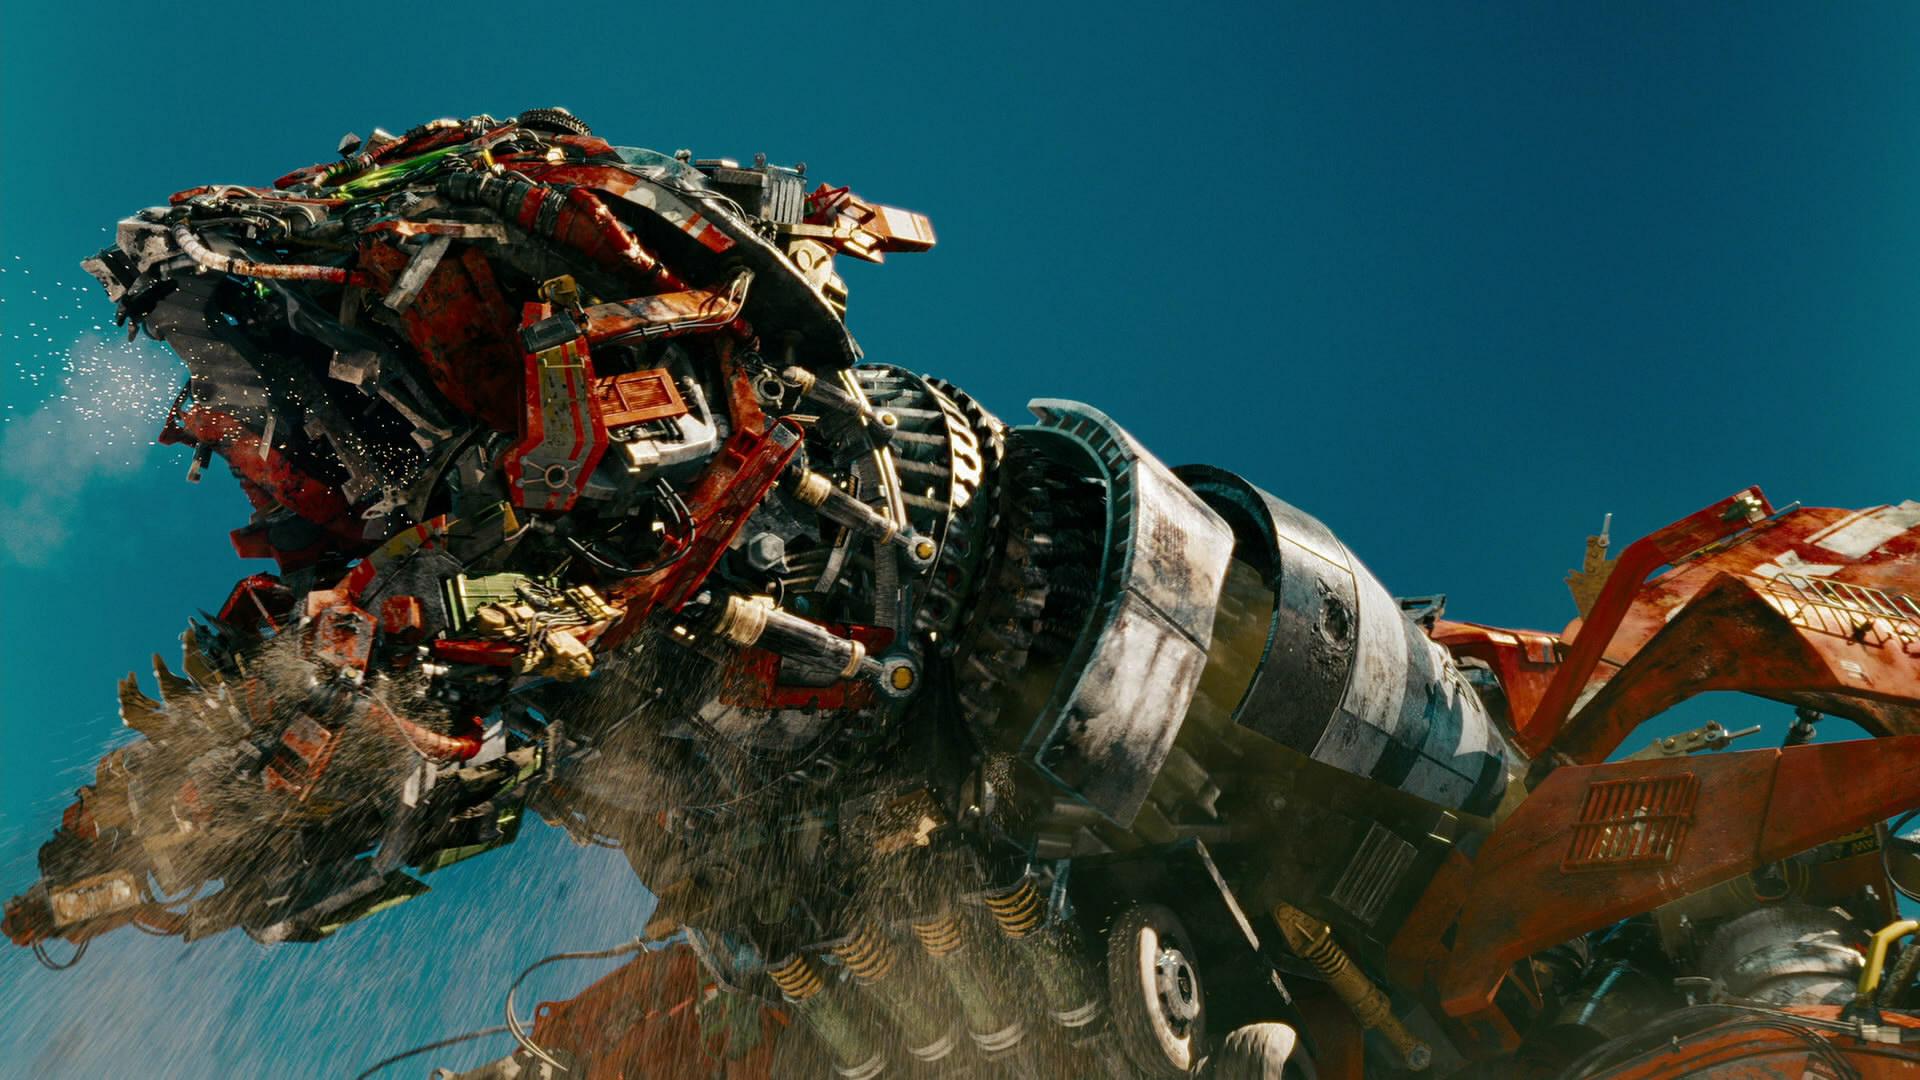 Fall Of Cybertron Wallpaper Hd Devastator Kaijumatic